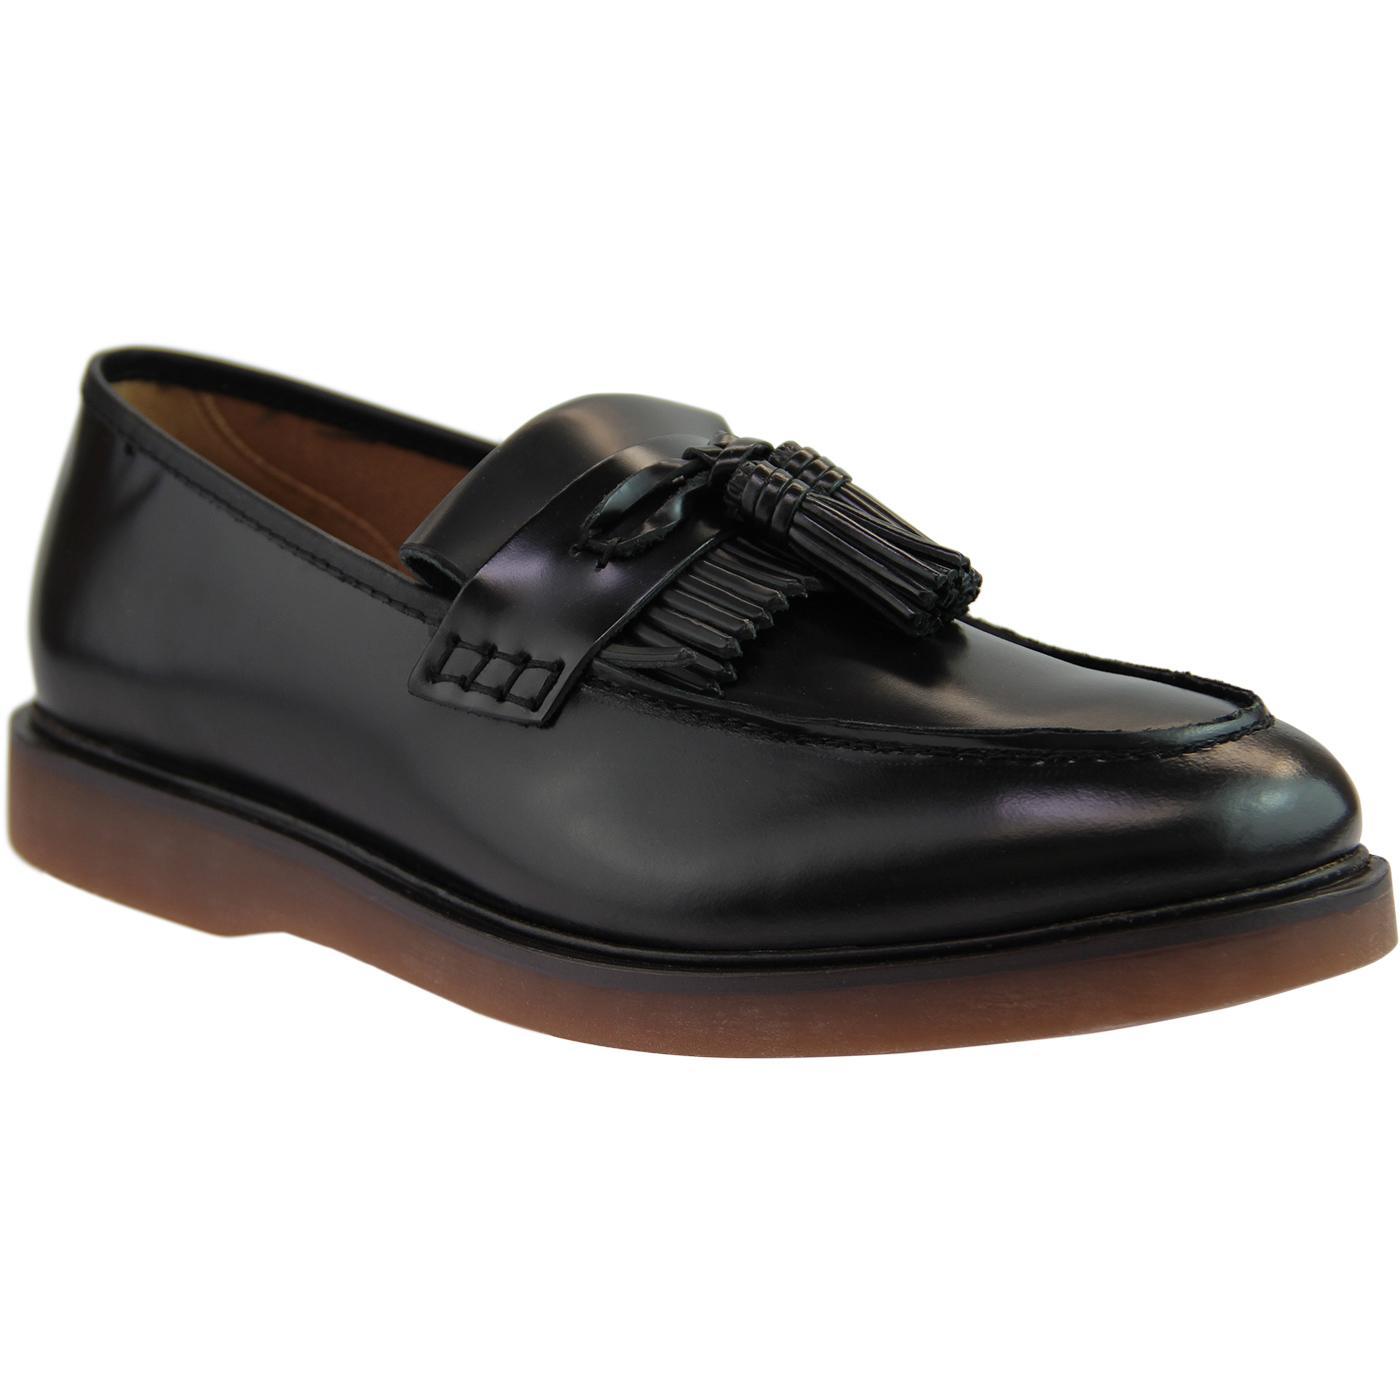 Calne HUDSON Retro Mod Tassel Fringe Loafers (B)